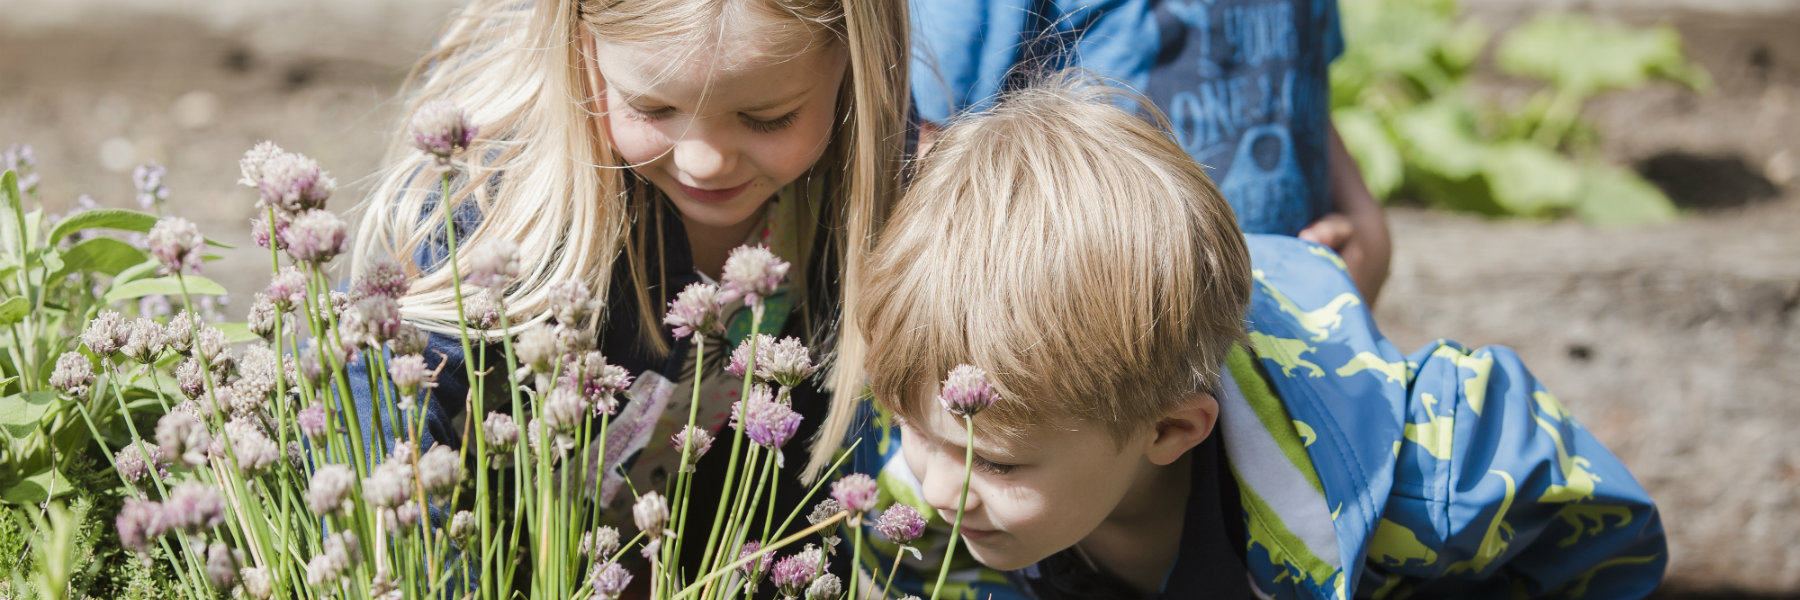 Nursery children smelling flowers